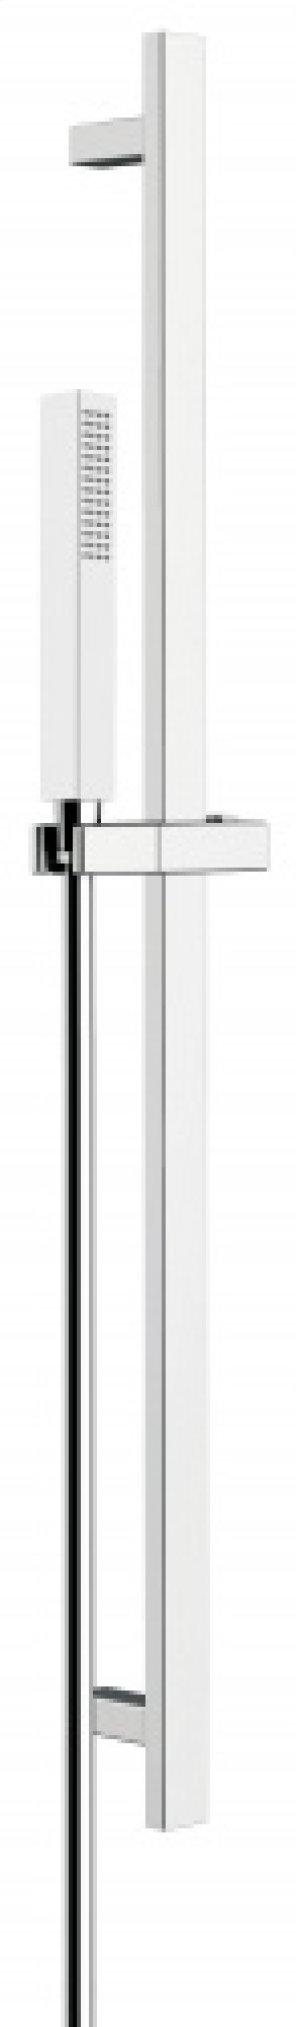 SHOWER KIT MINI PURE ABS CHROME Product Image